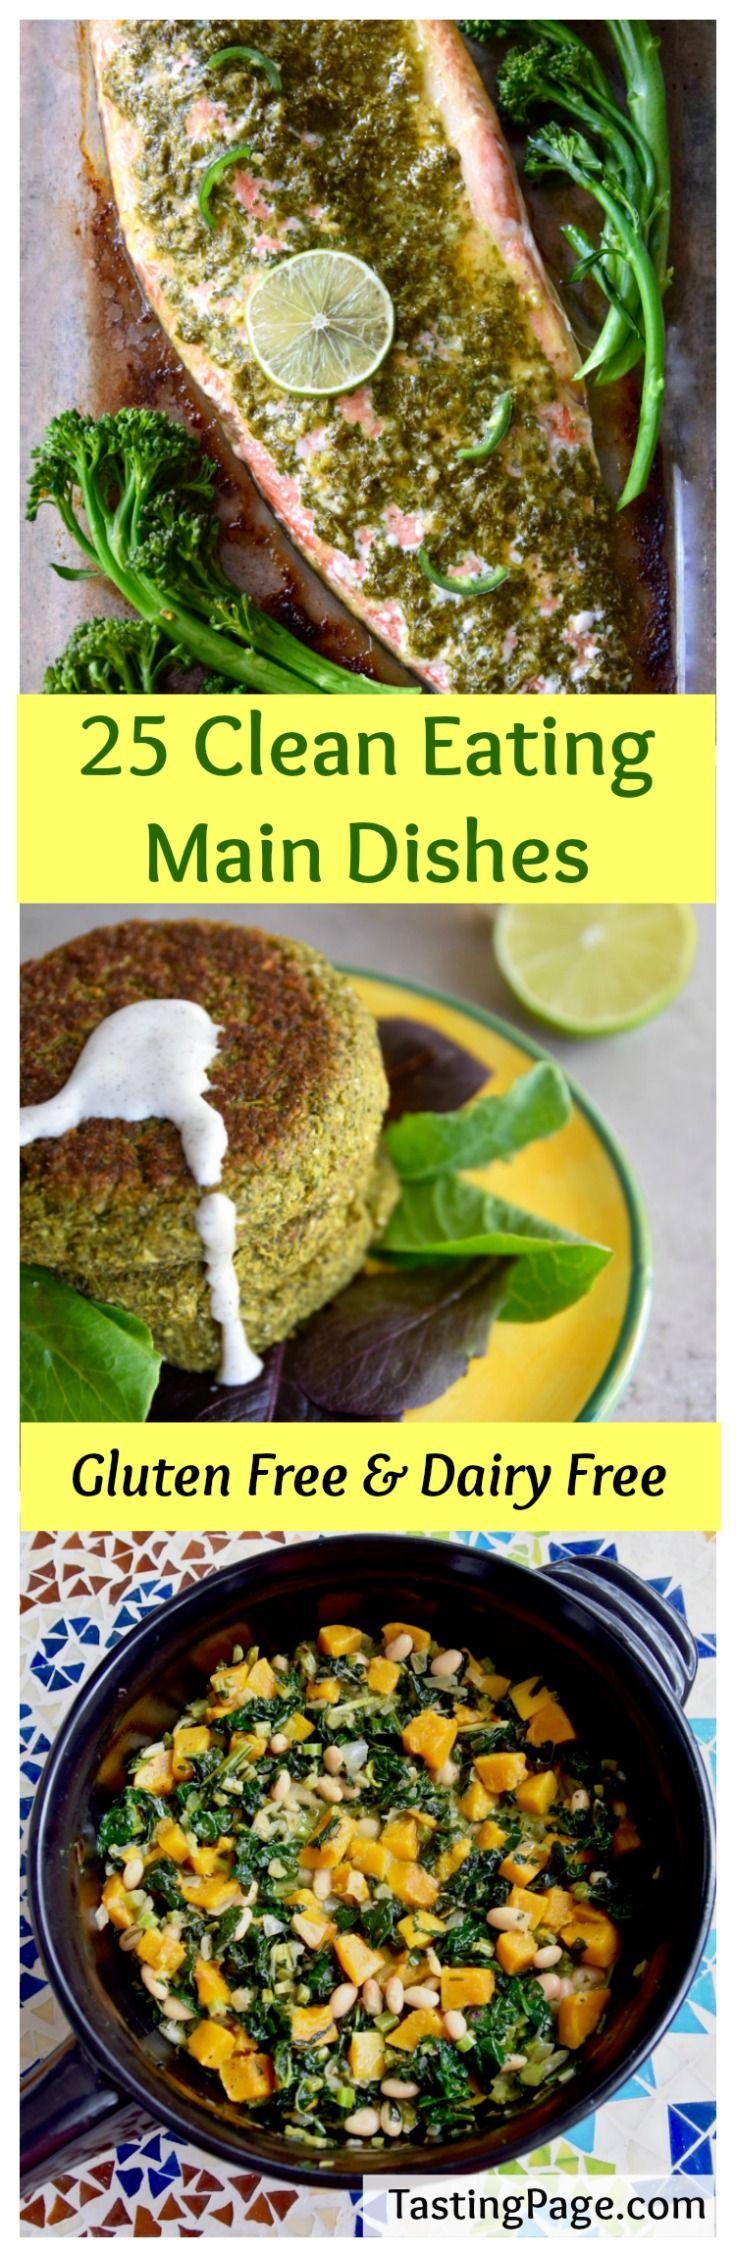 25 Clean Eating Main Dish Recipes - gluten free, dairy free and sugar free. Vegan, paleo and whole 30 options too | TastingPage.com